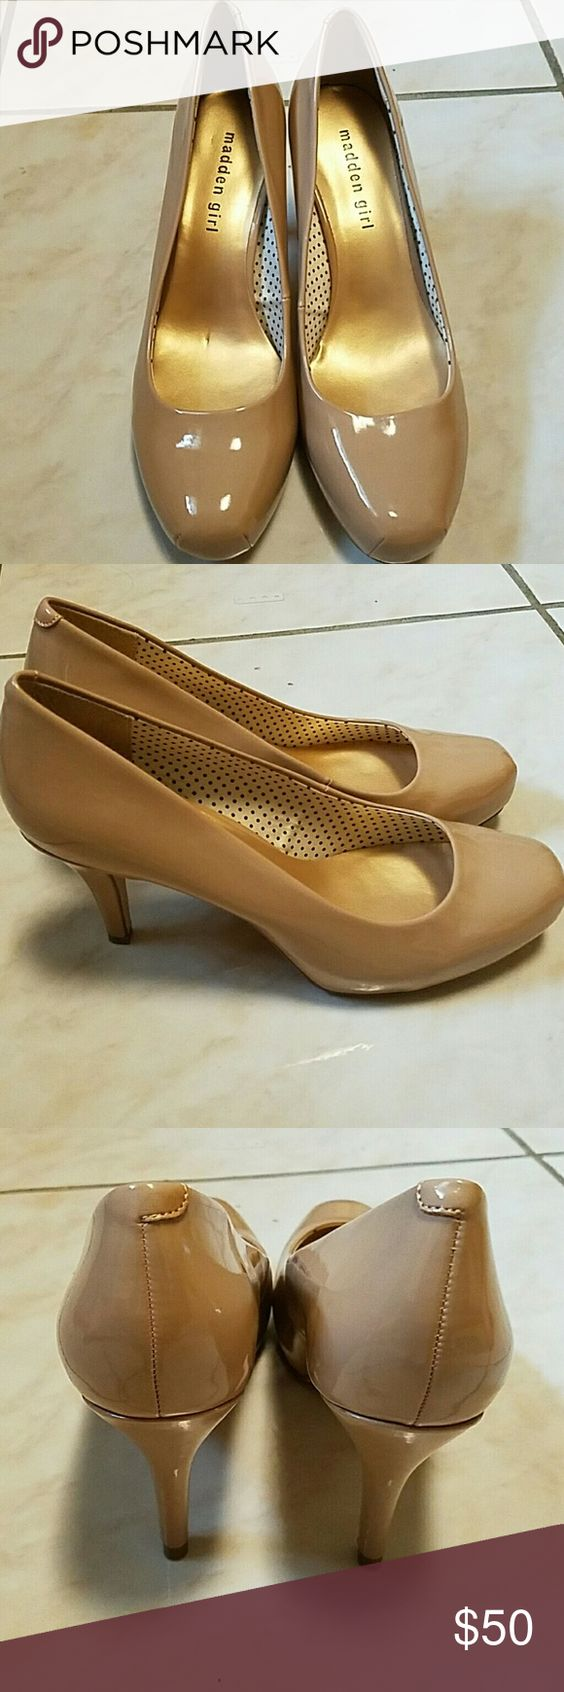 Steve Madden heels Brand new, never worn beige heels. Size 8 1/2. Steve Madden Shoes Heels